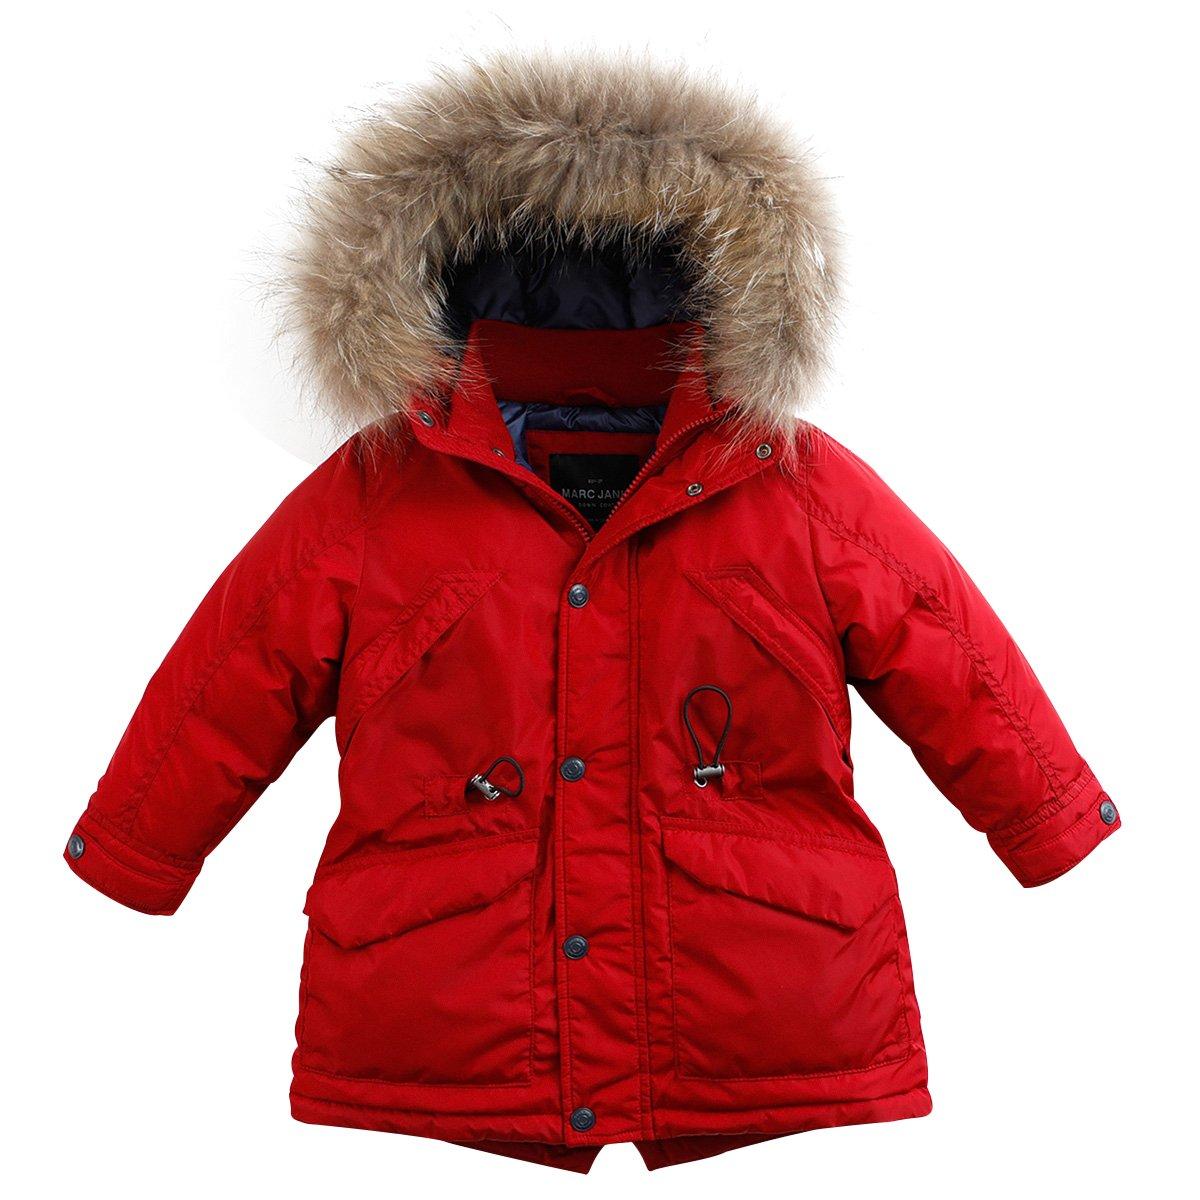 marc janie Baby Boys Kids' Lightweight Down Jacket With Raccoon Fur Collar Hood Puffer Winter Coat Deep Red 6T